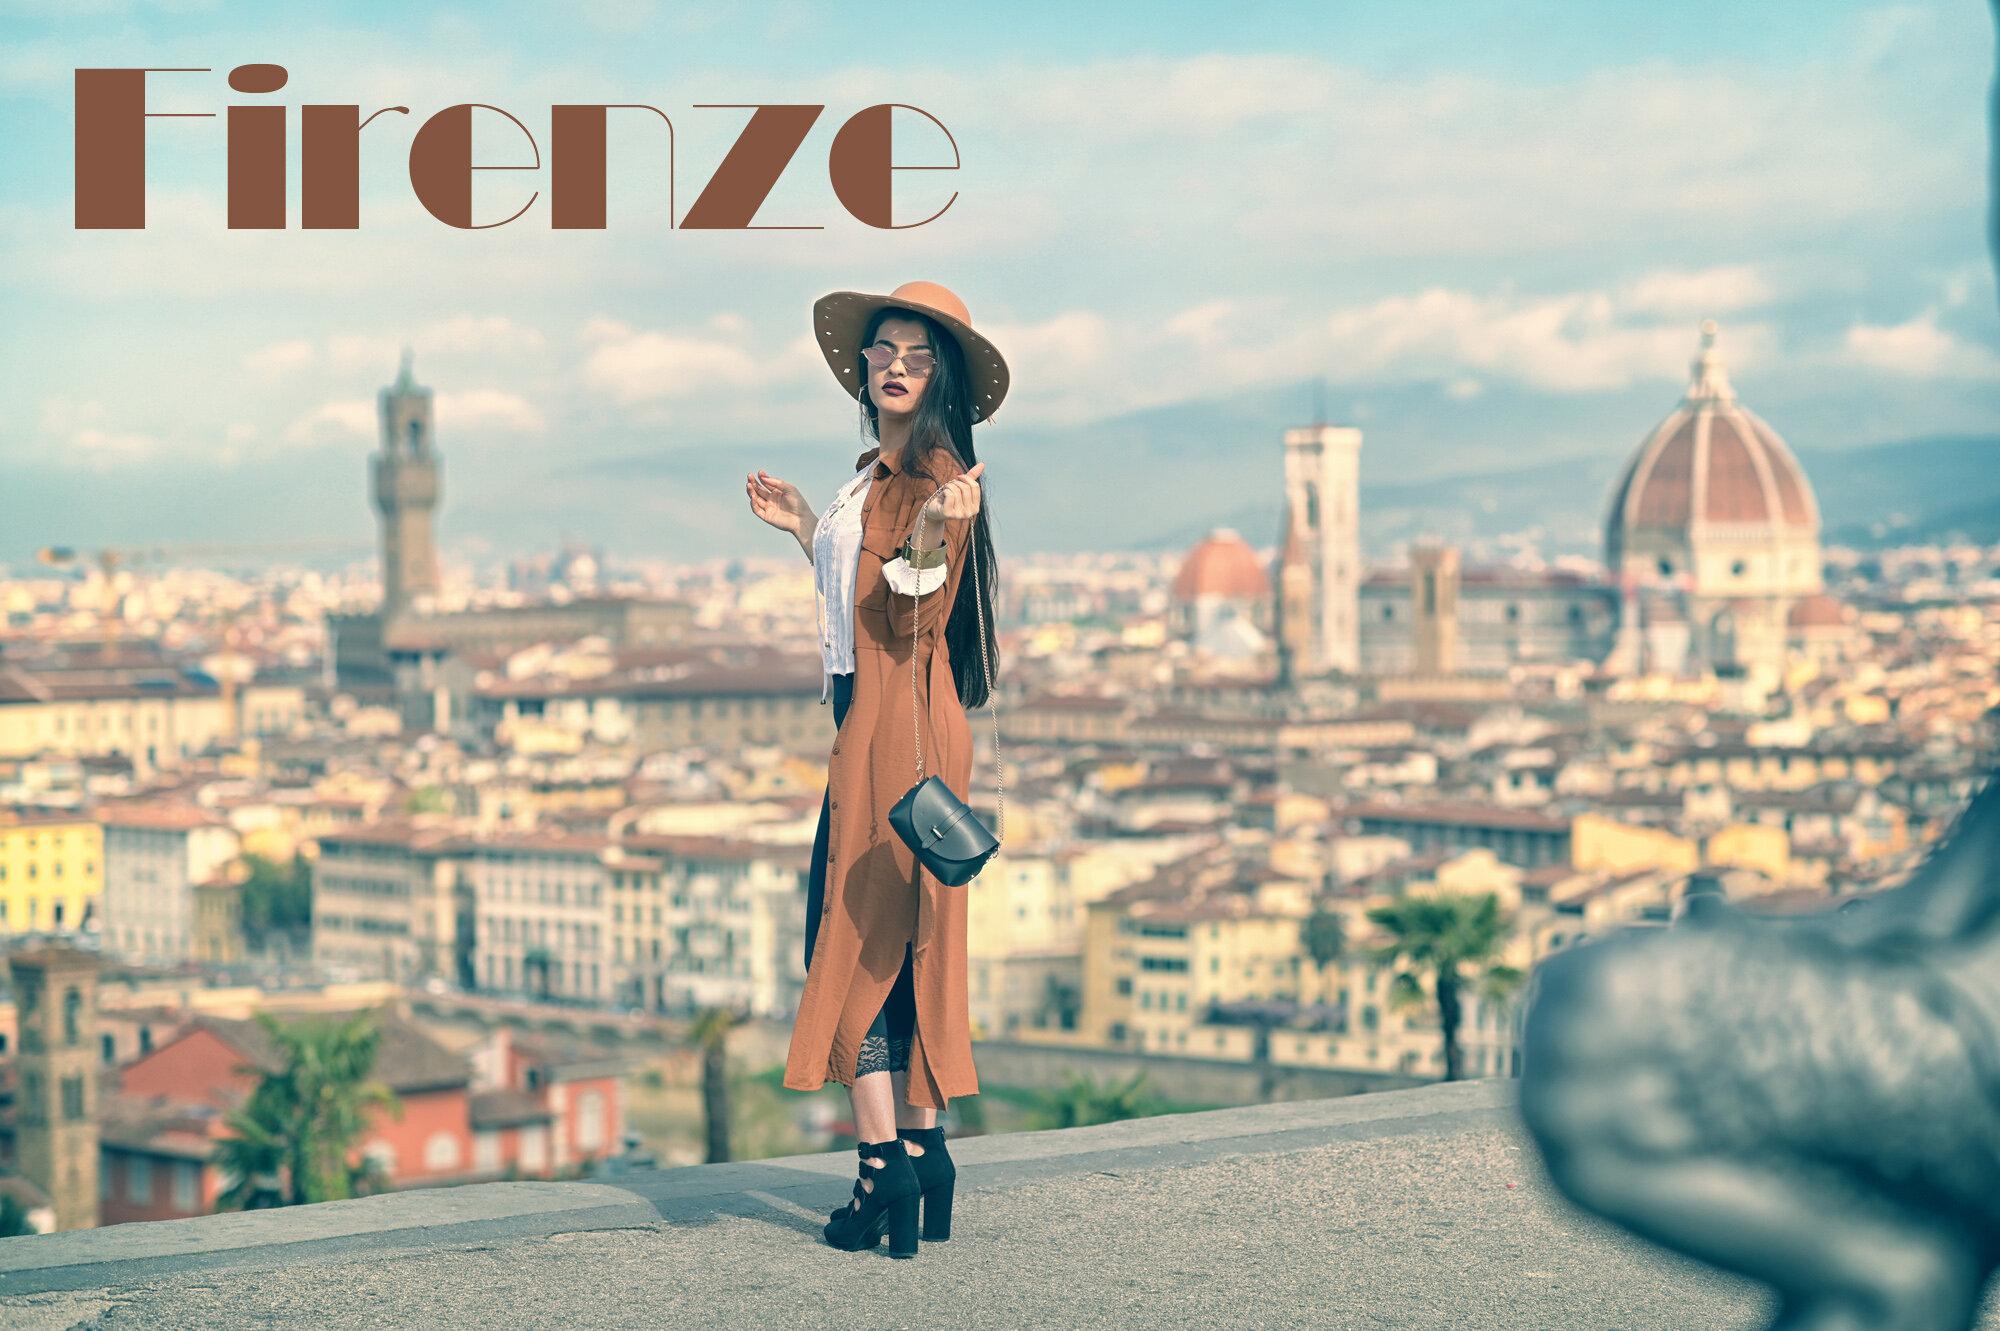 Florenz_Fotokurs_Cover.jpg